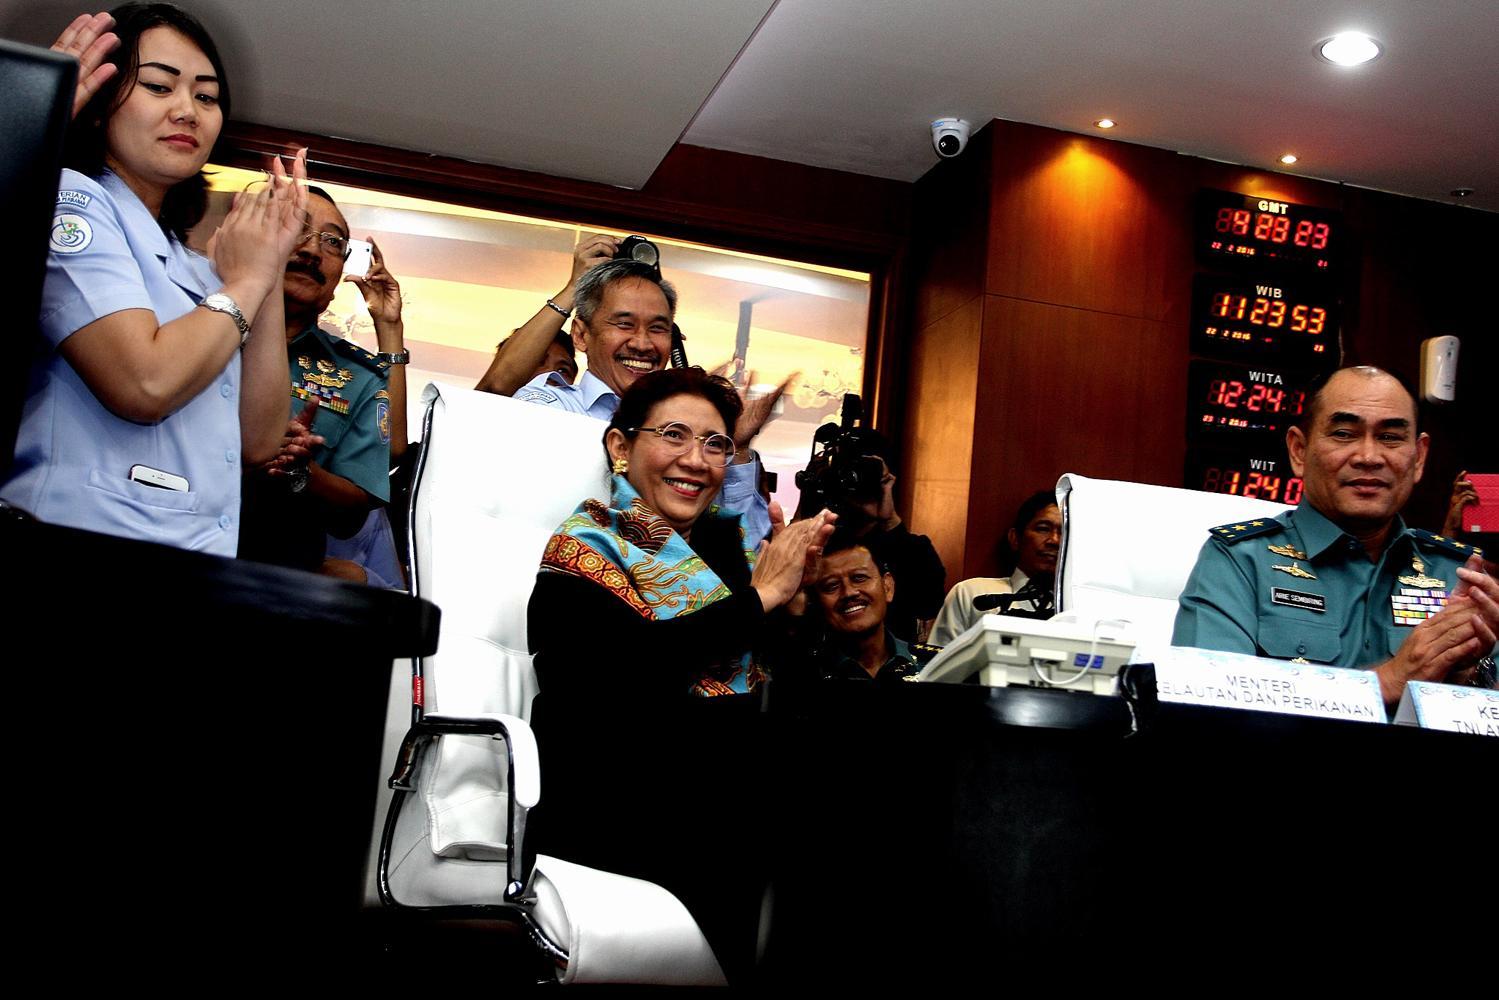 Menteri Kelautan dan Perikanan, Susi Pudjiastuti, bertepuk tangan setelah melihat proses penenggelaman secara langsung melalui video live streaming, penenggelaman dilakukan sebanyak 31 kapal IUUF (20/02).